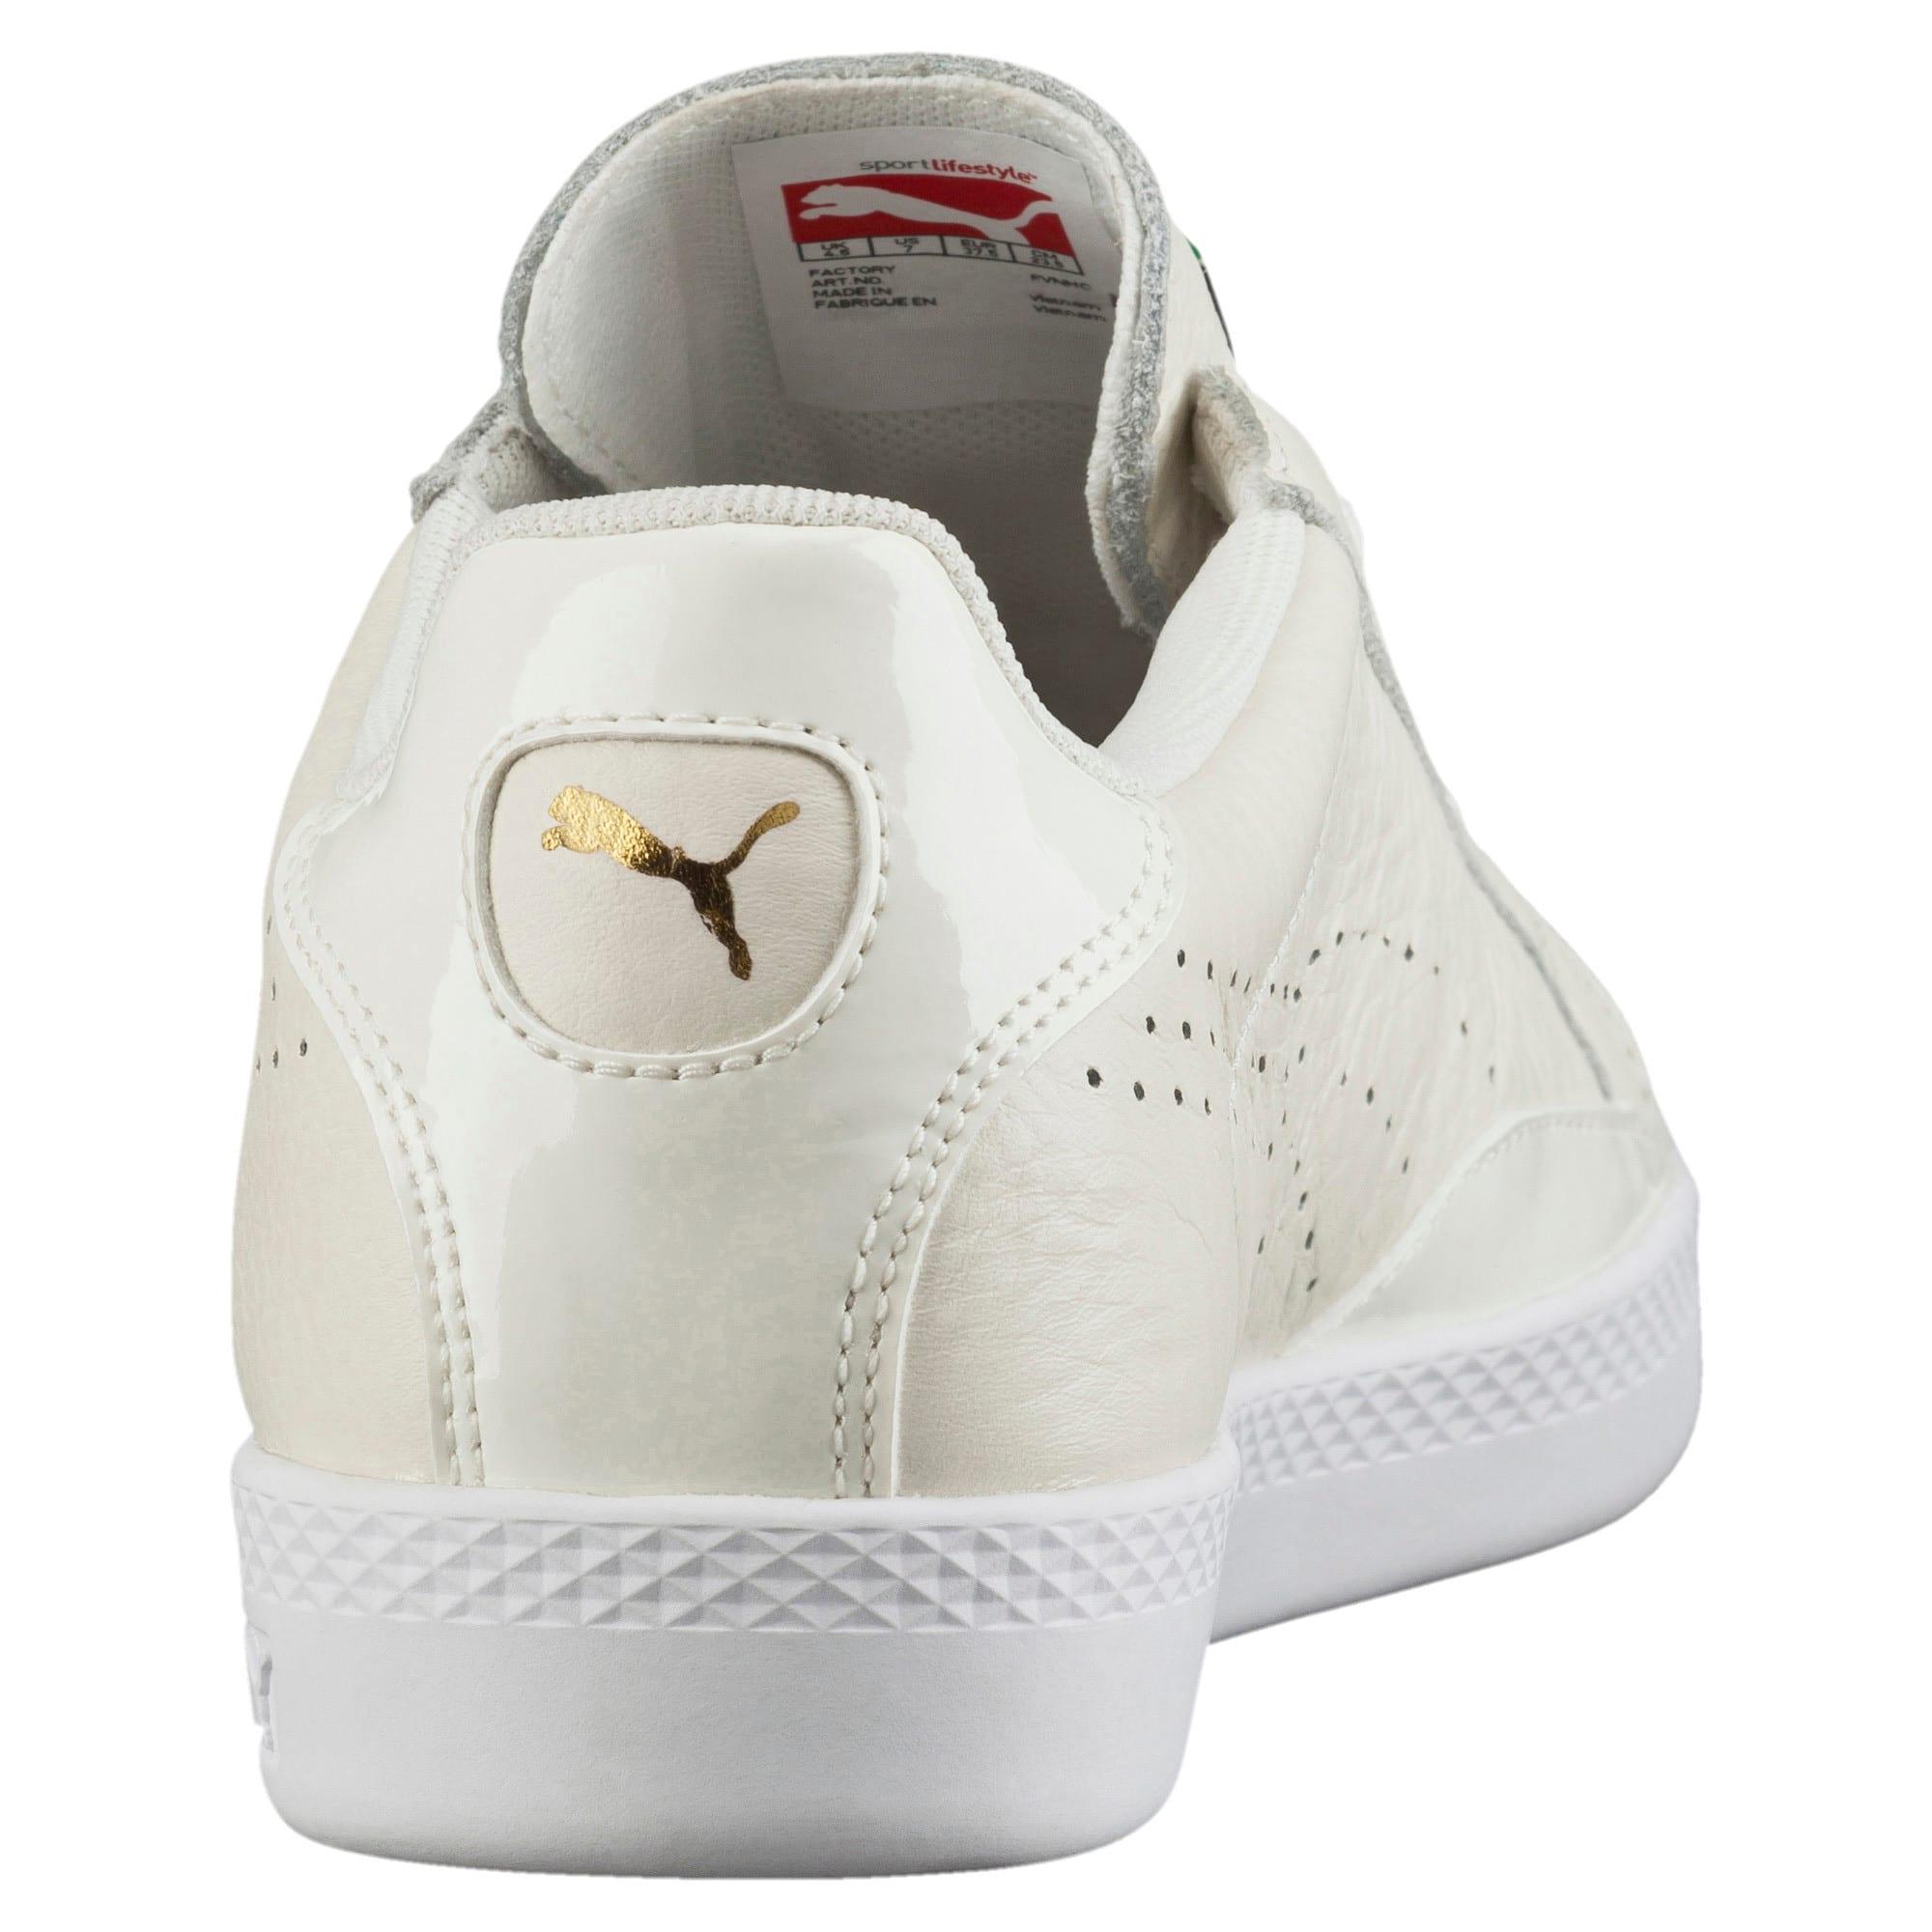 Thumbnail 4 of Match Women's Sneakers, marshmallow-white, medium